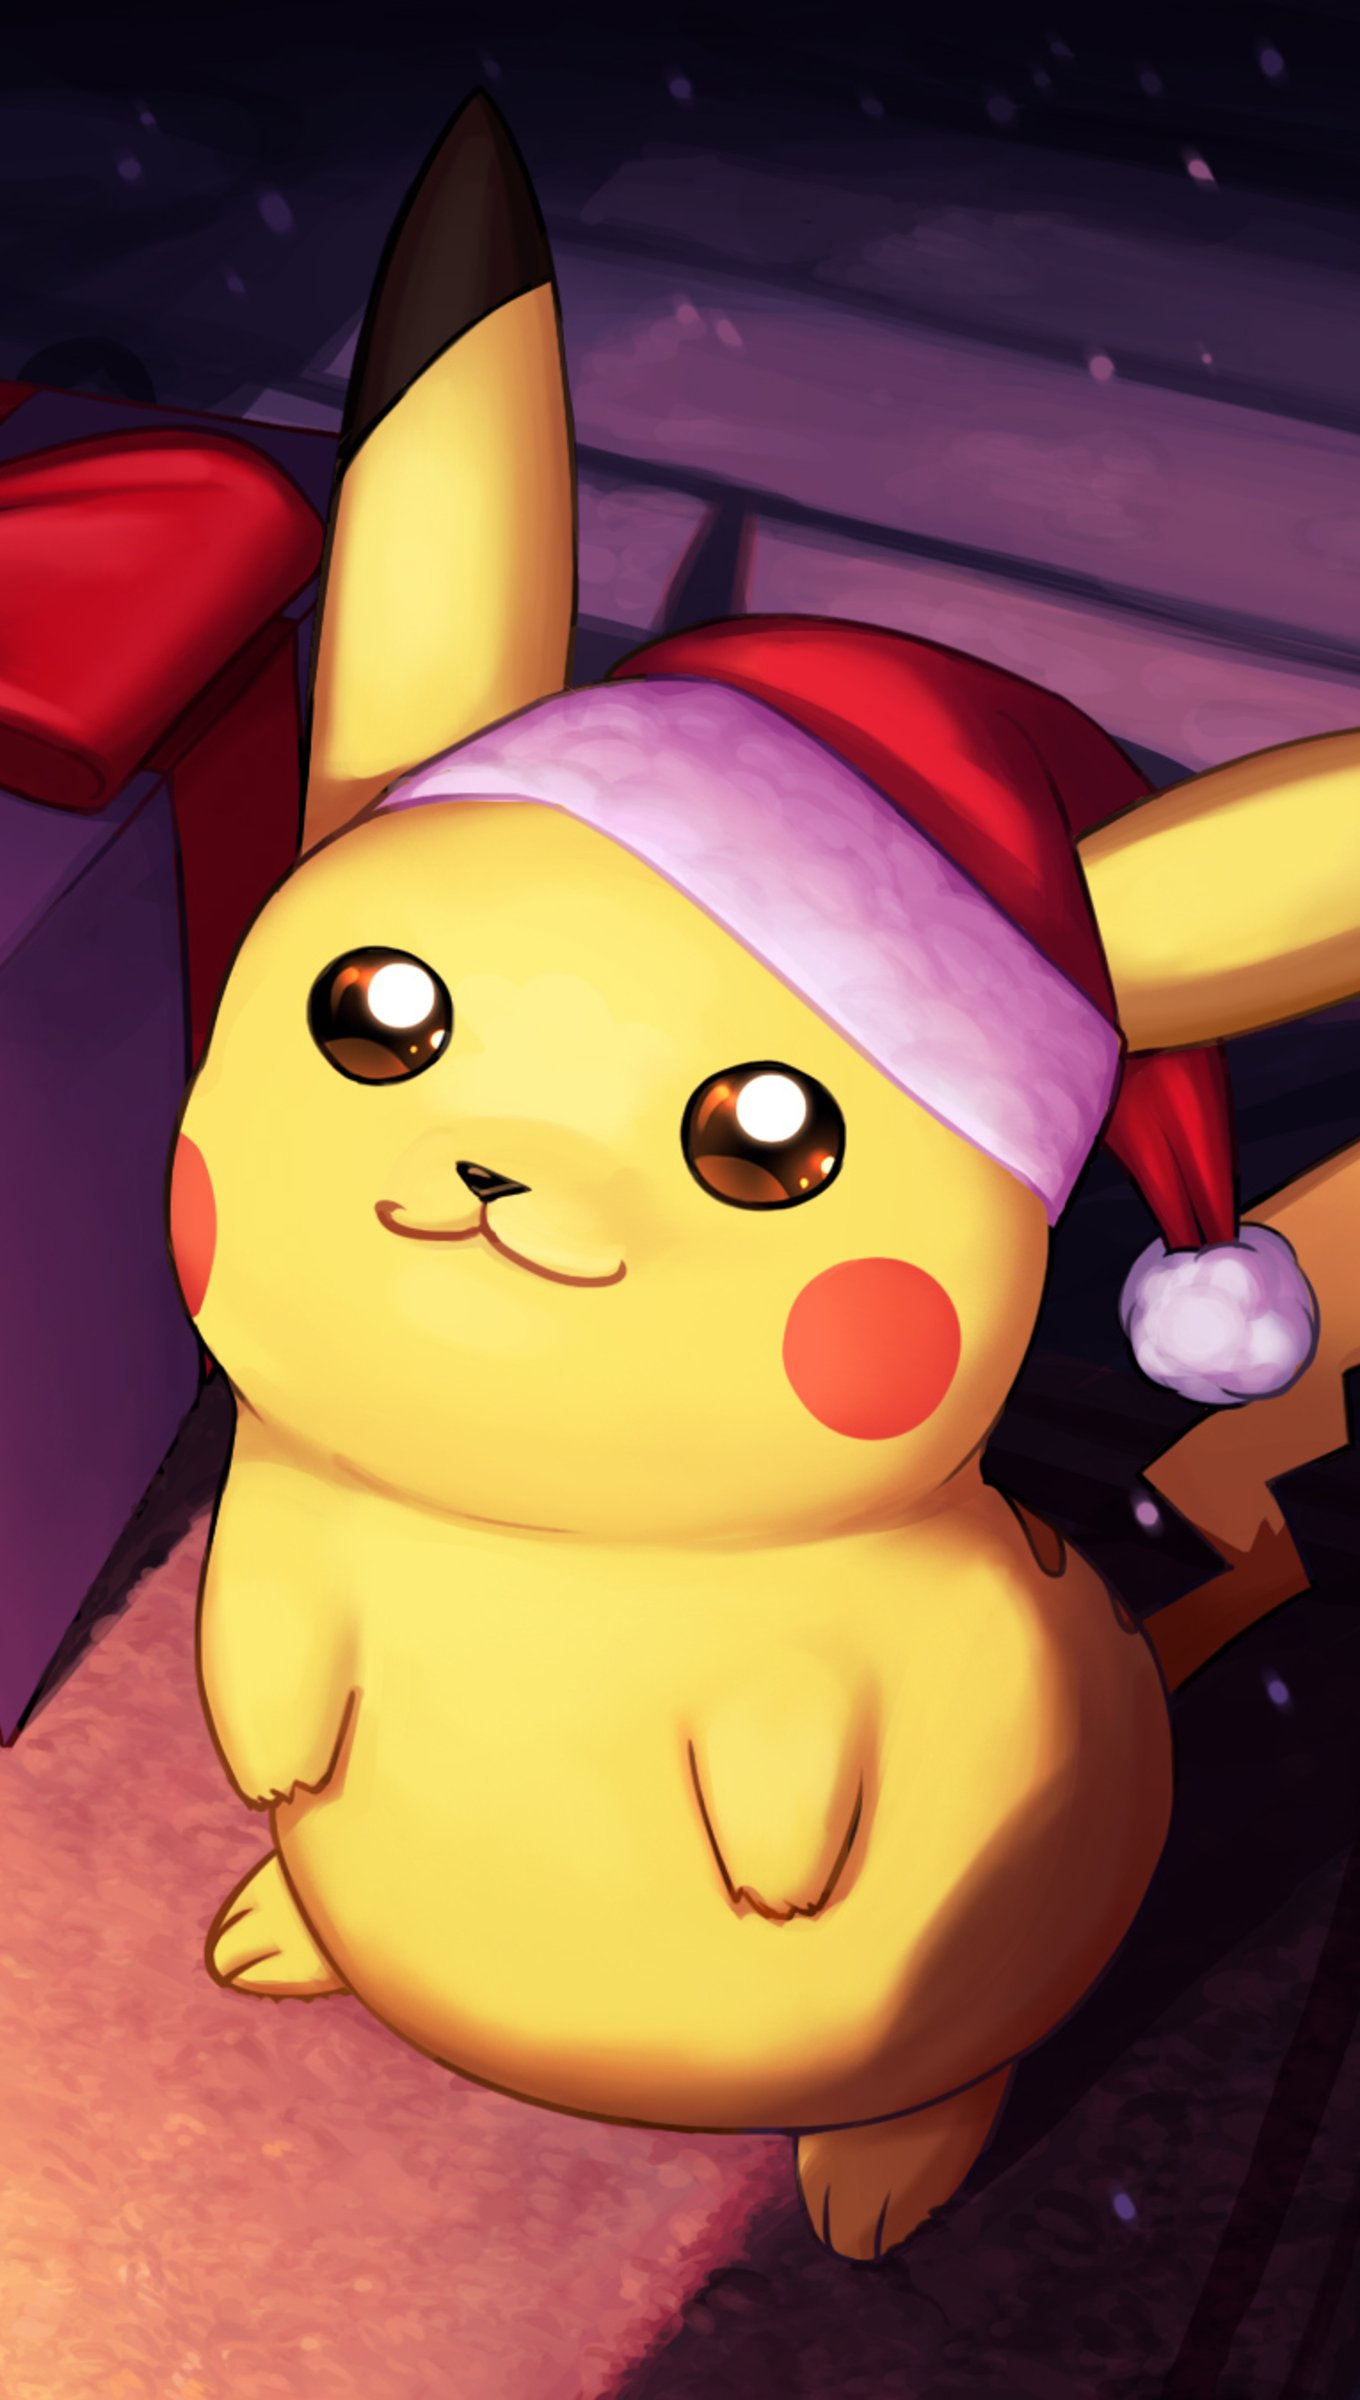 Wallpaper Pikachu on christmas day Vertical